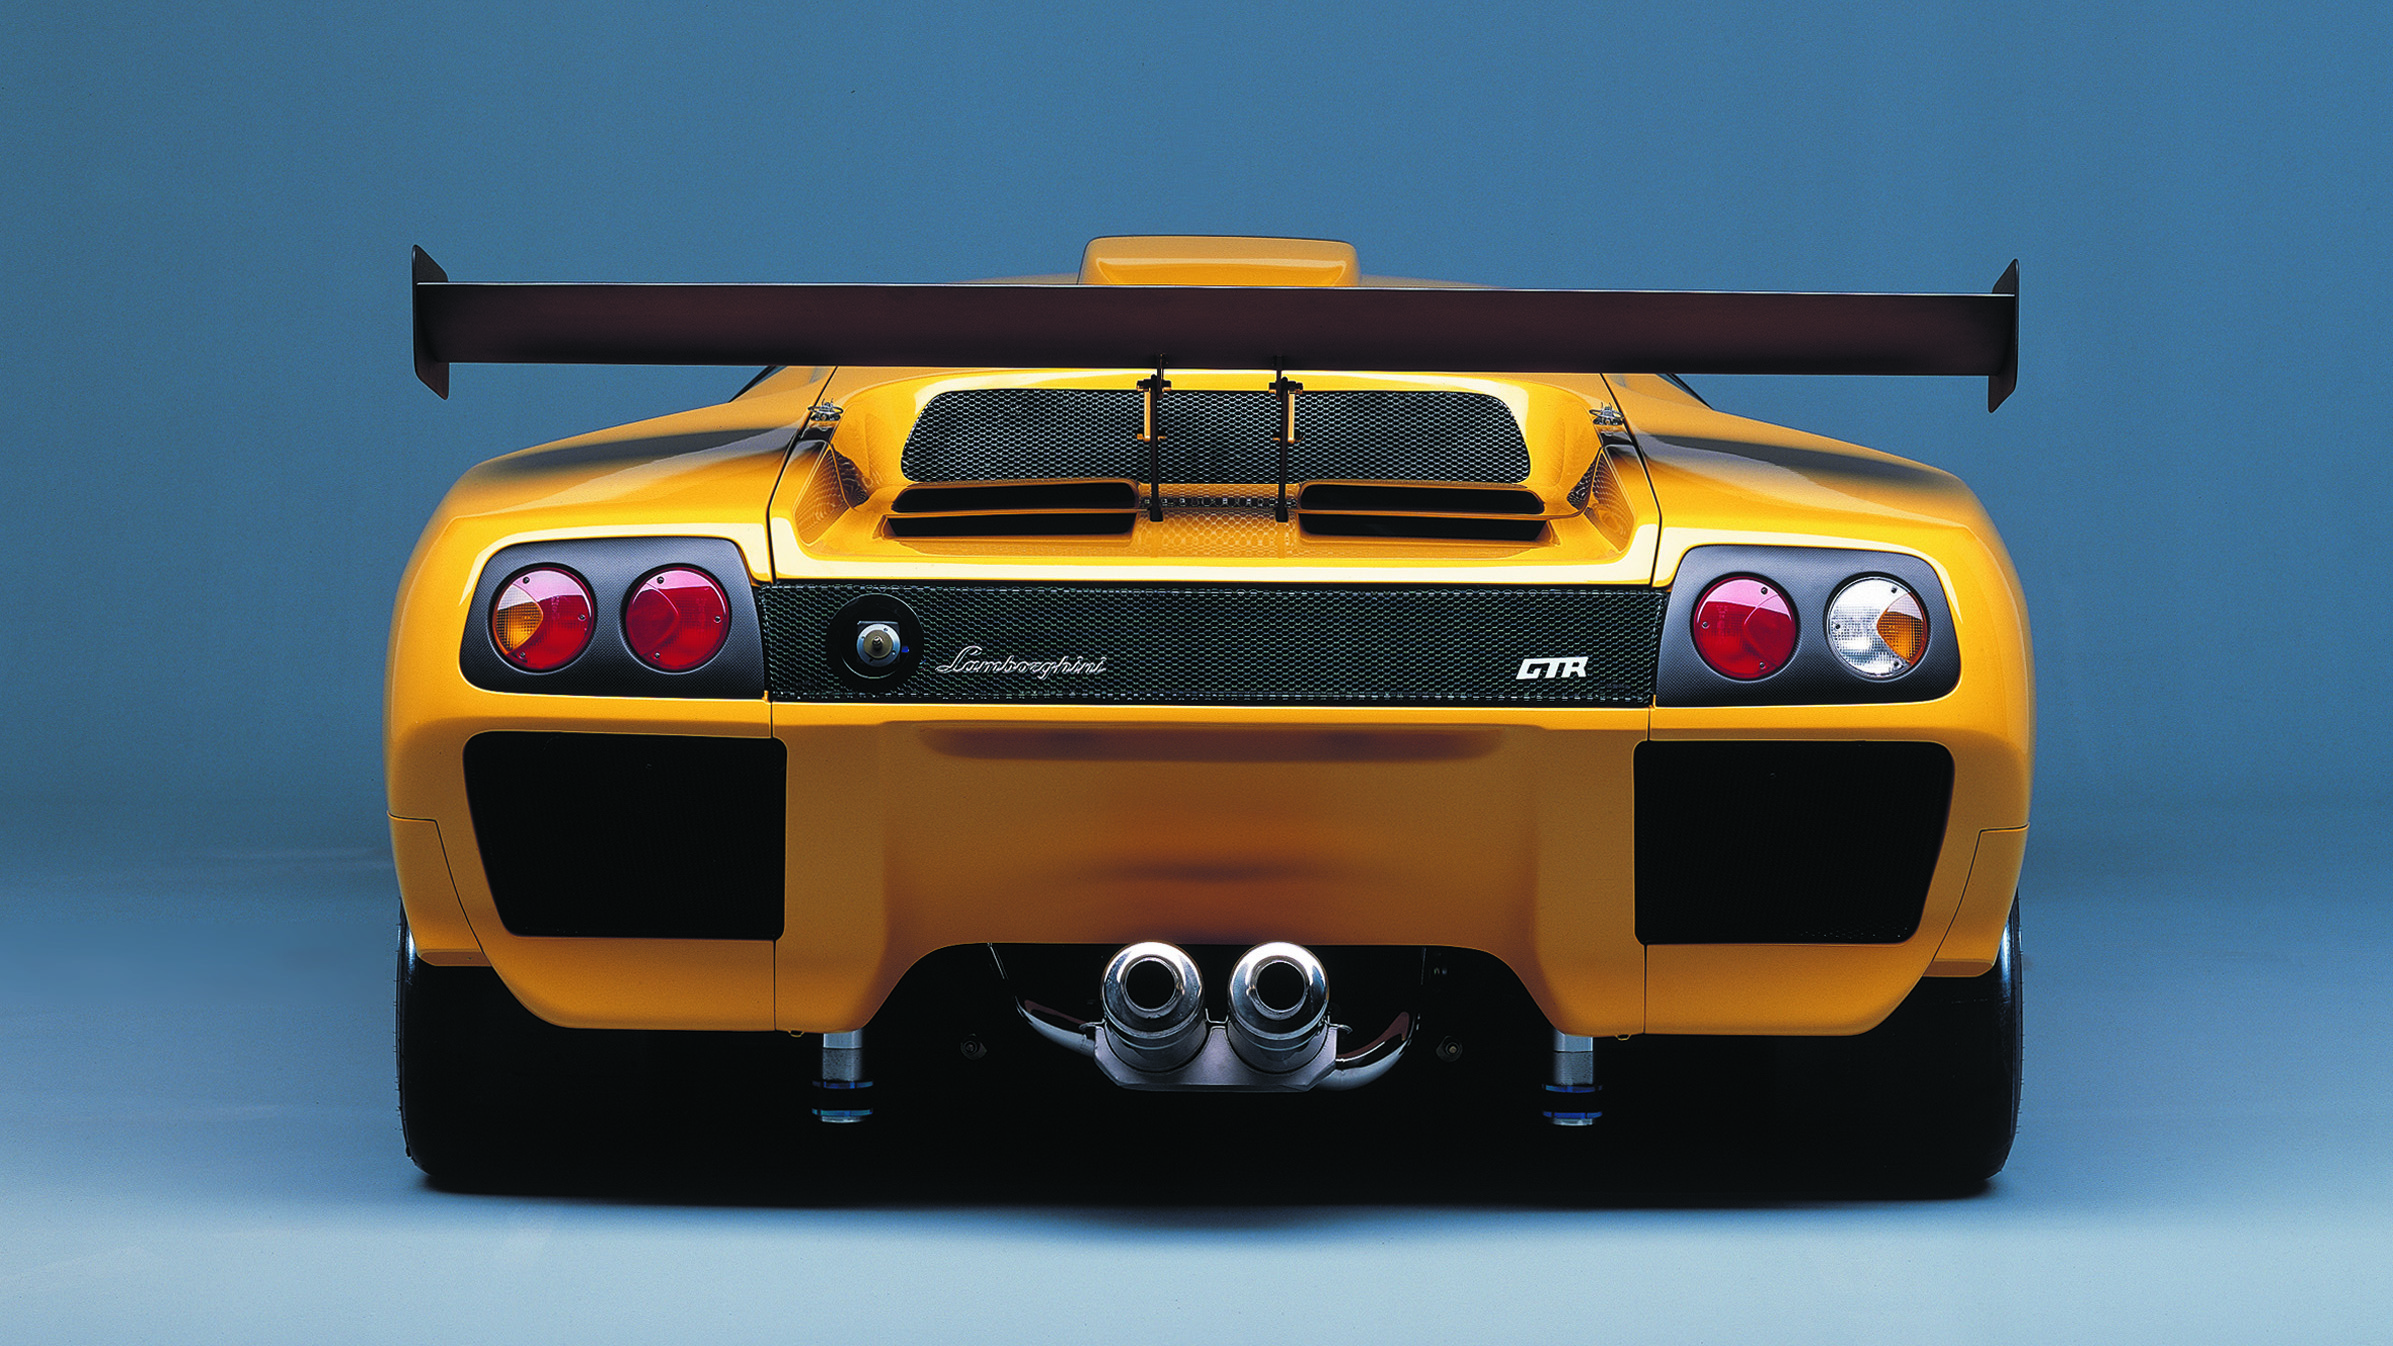 Lamborghini Diablo yellow rear